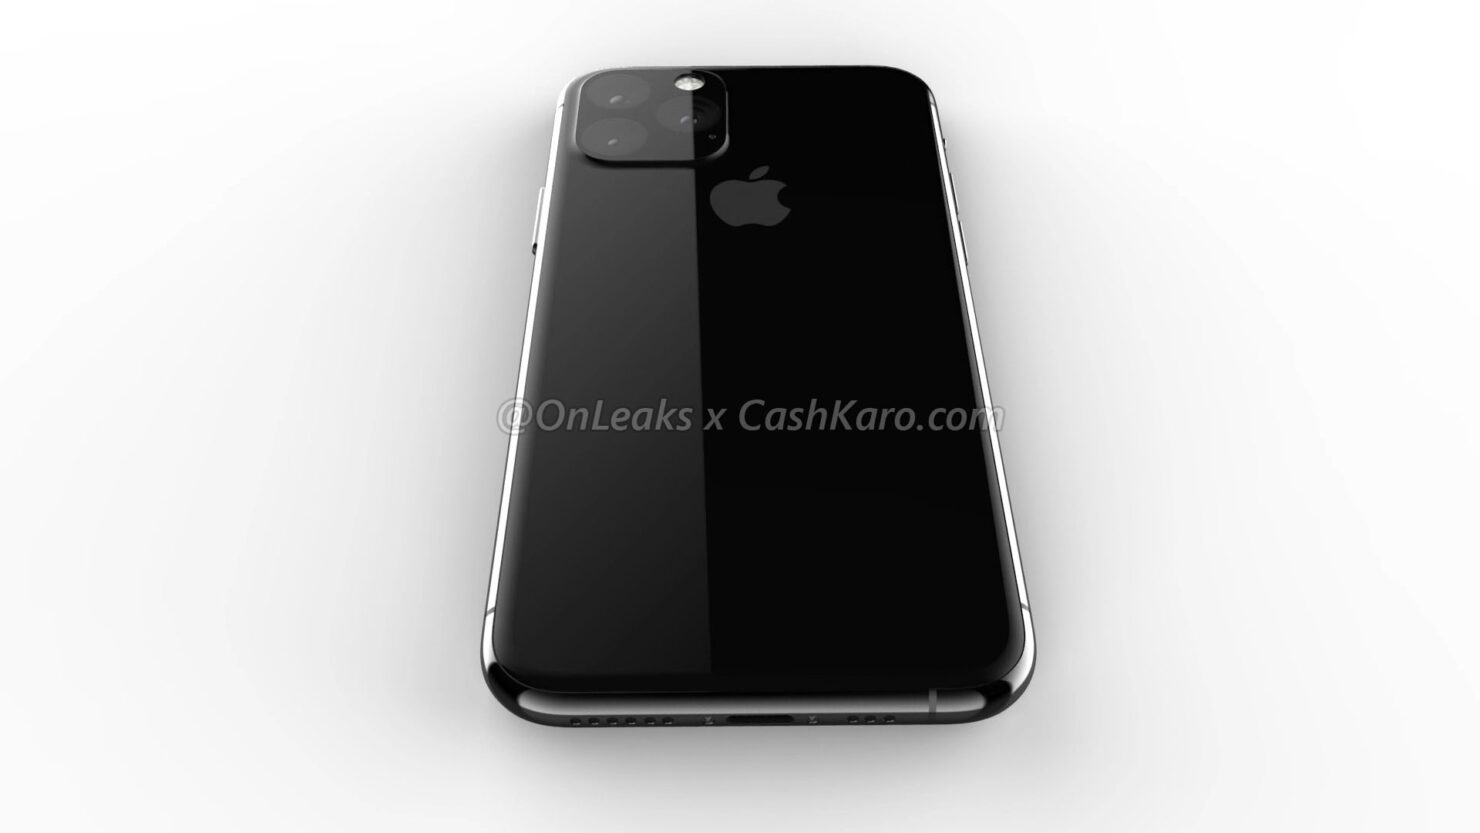 iphone-xi-08-cashkaro